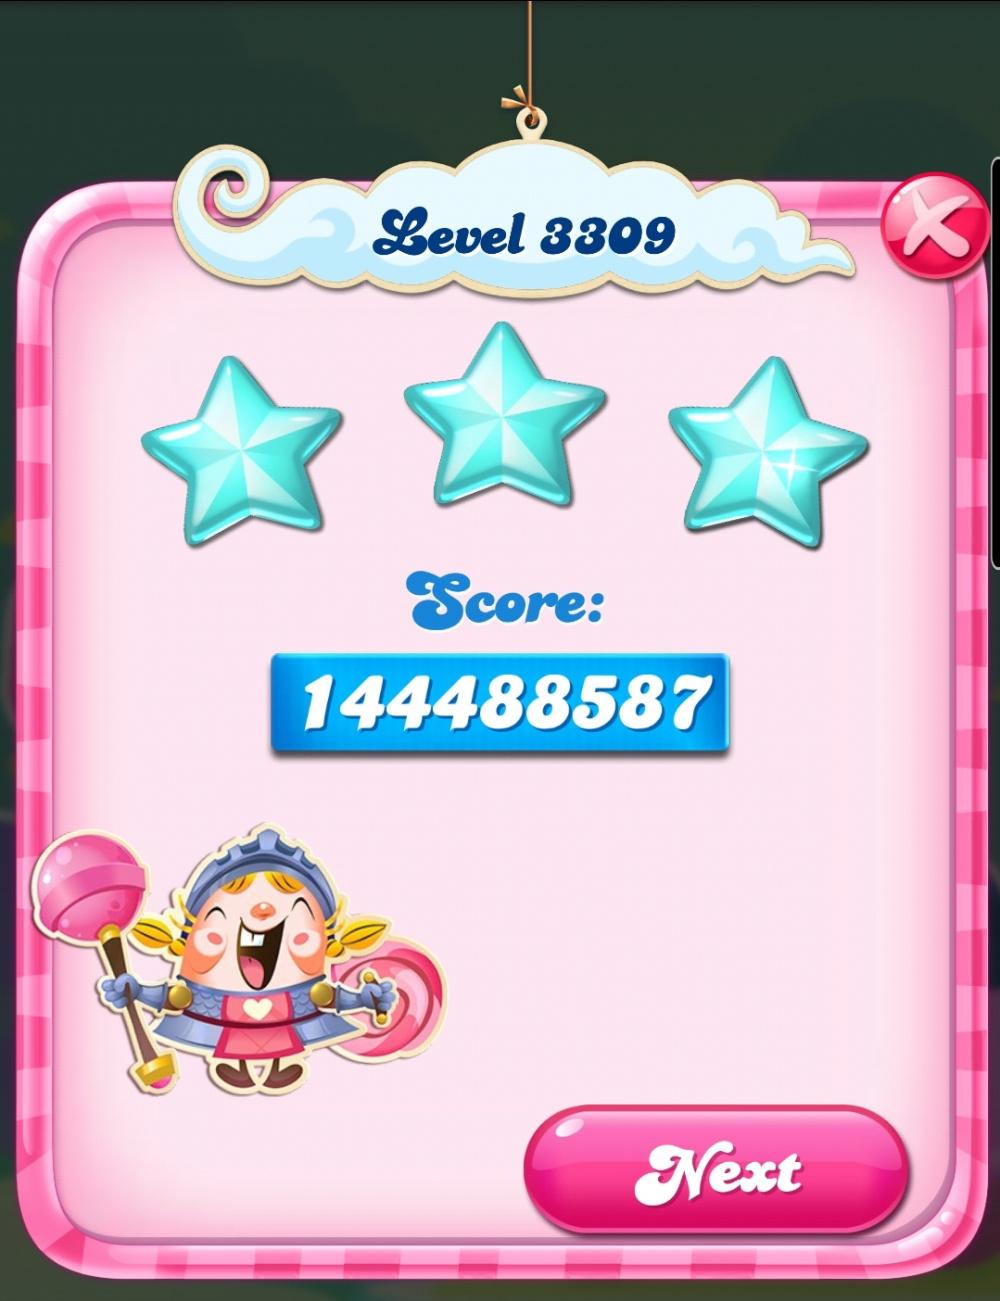 SmartSelect_20200712-104759_Candy Crush Saga.jpg